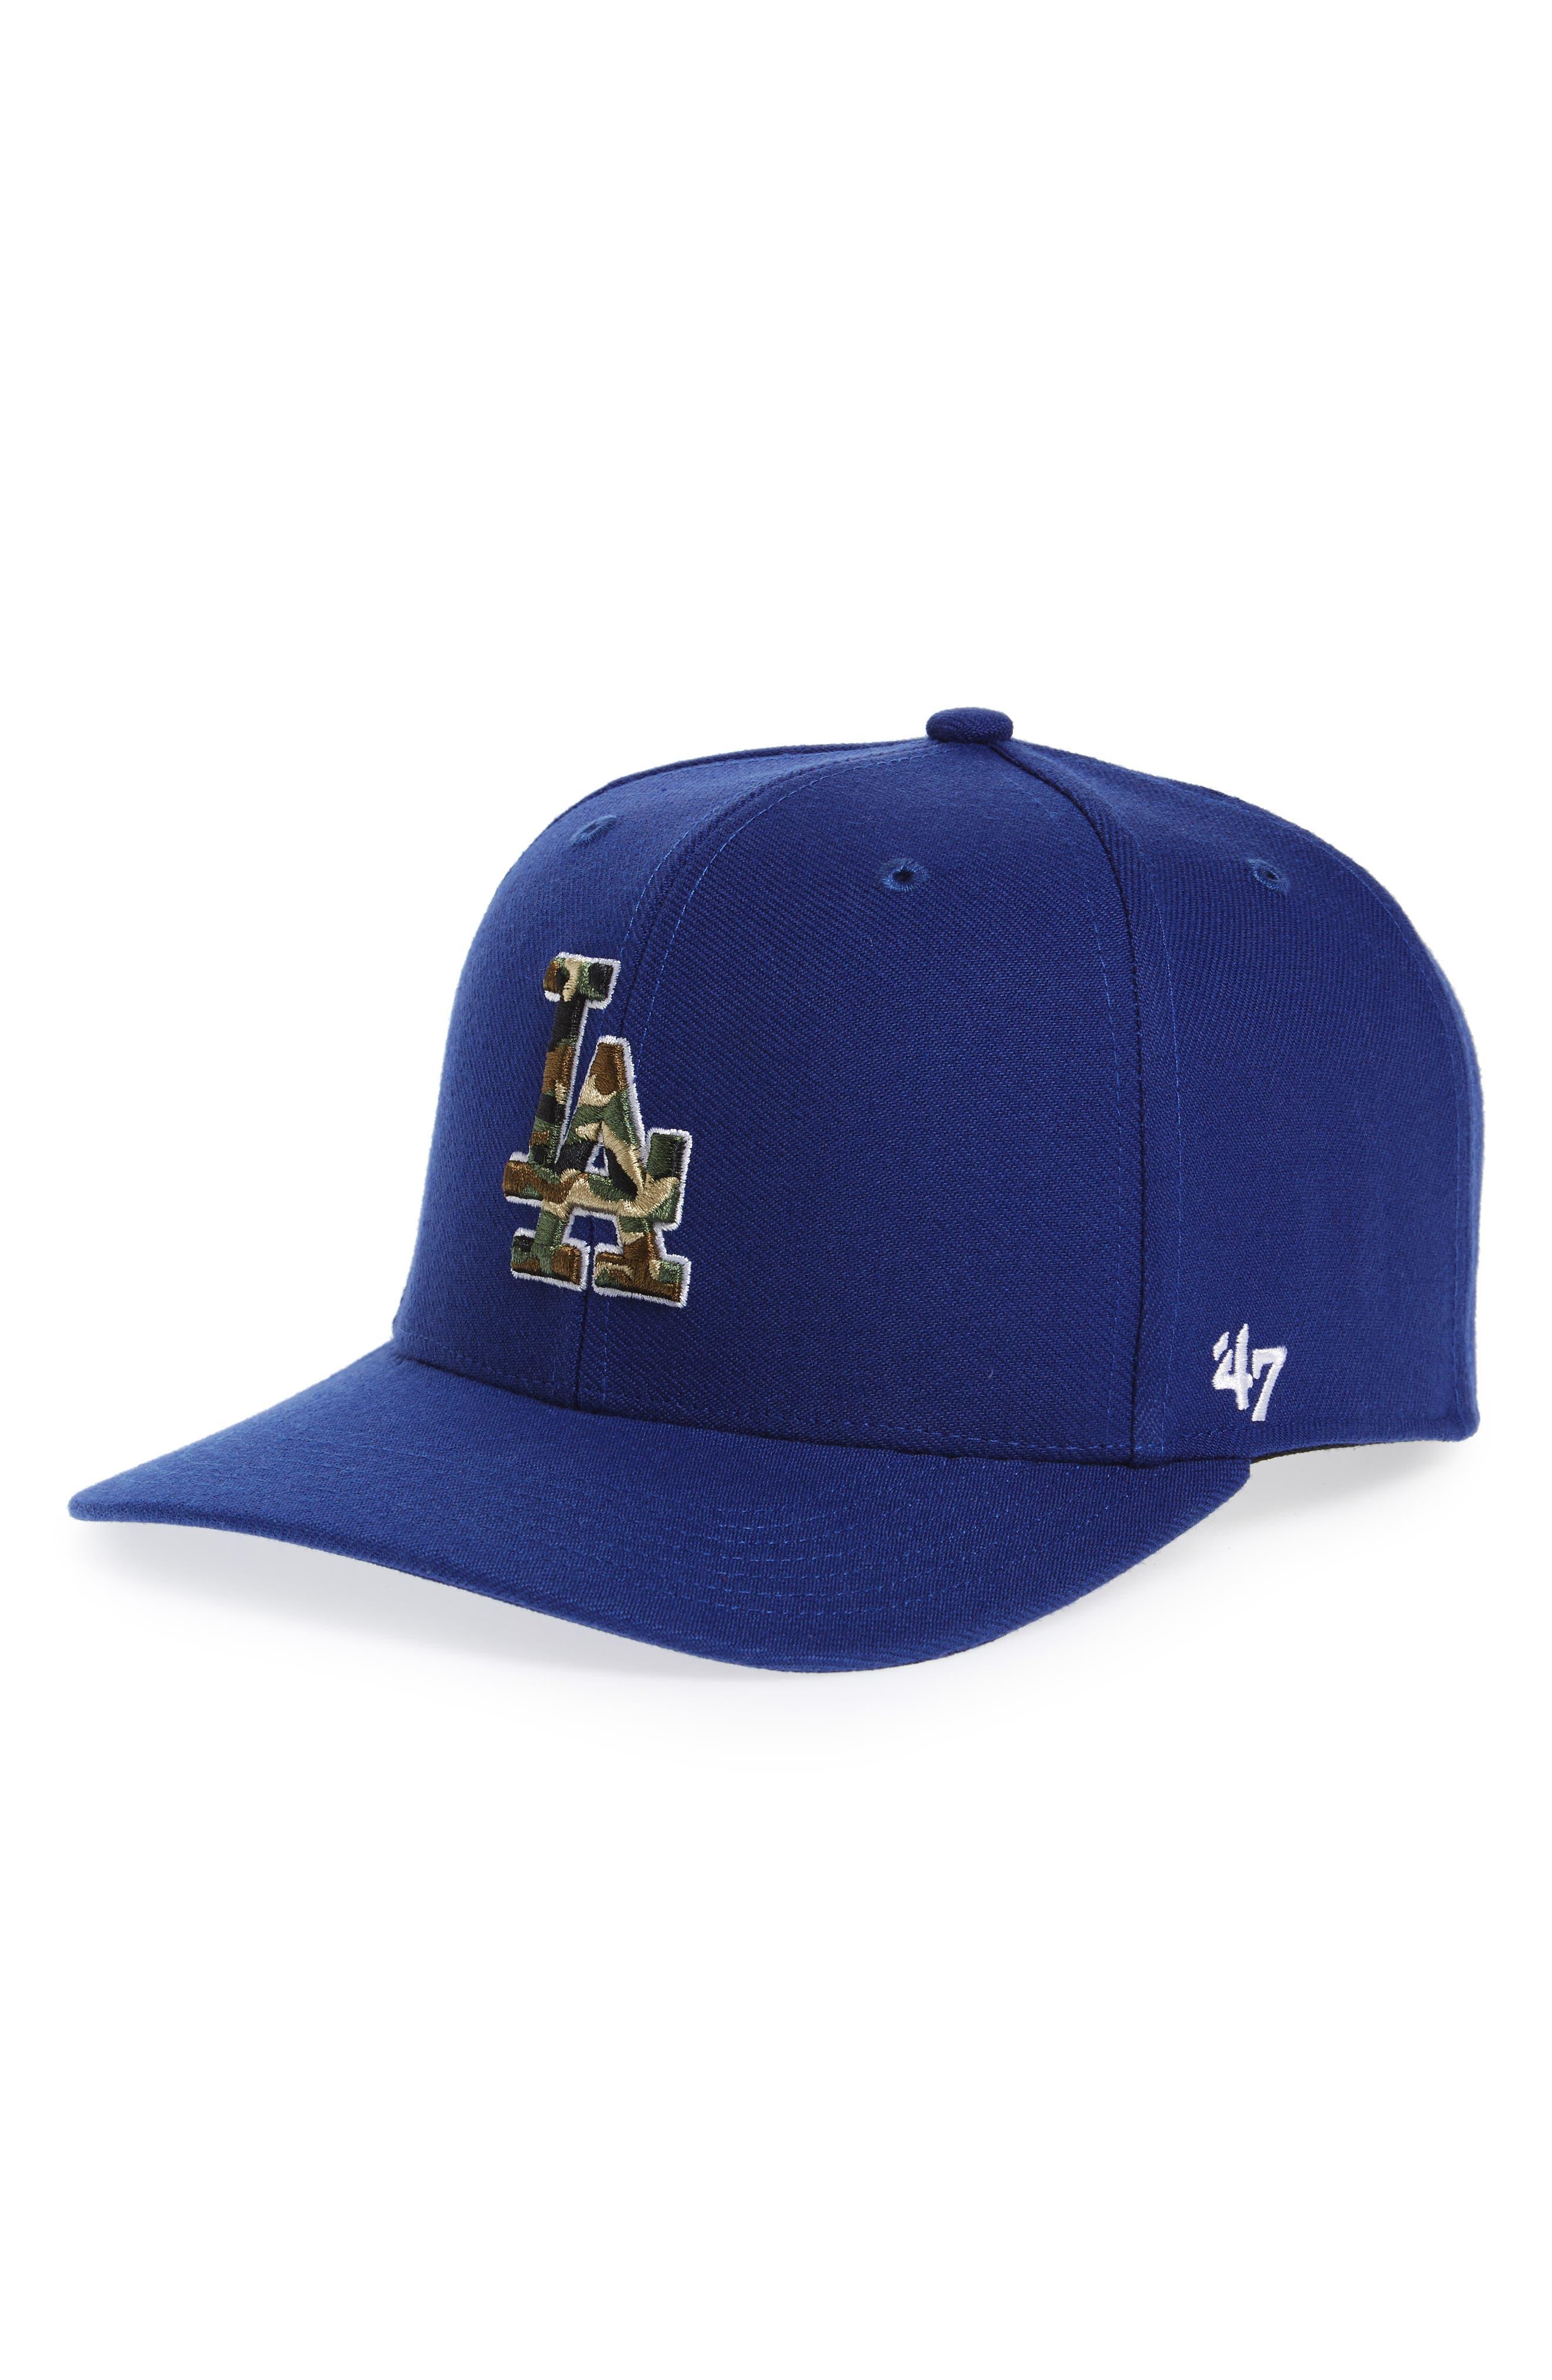 '47 Brand Los Angeles Dodgers - Camouflage Baseball Cap